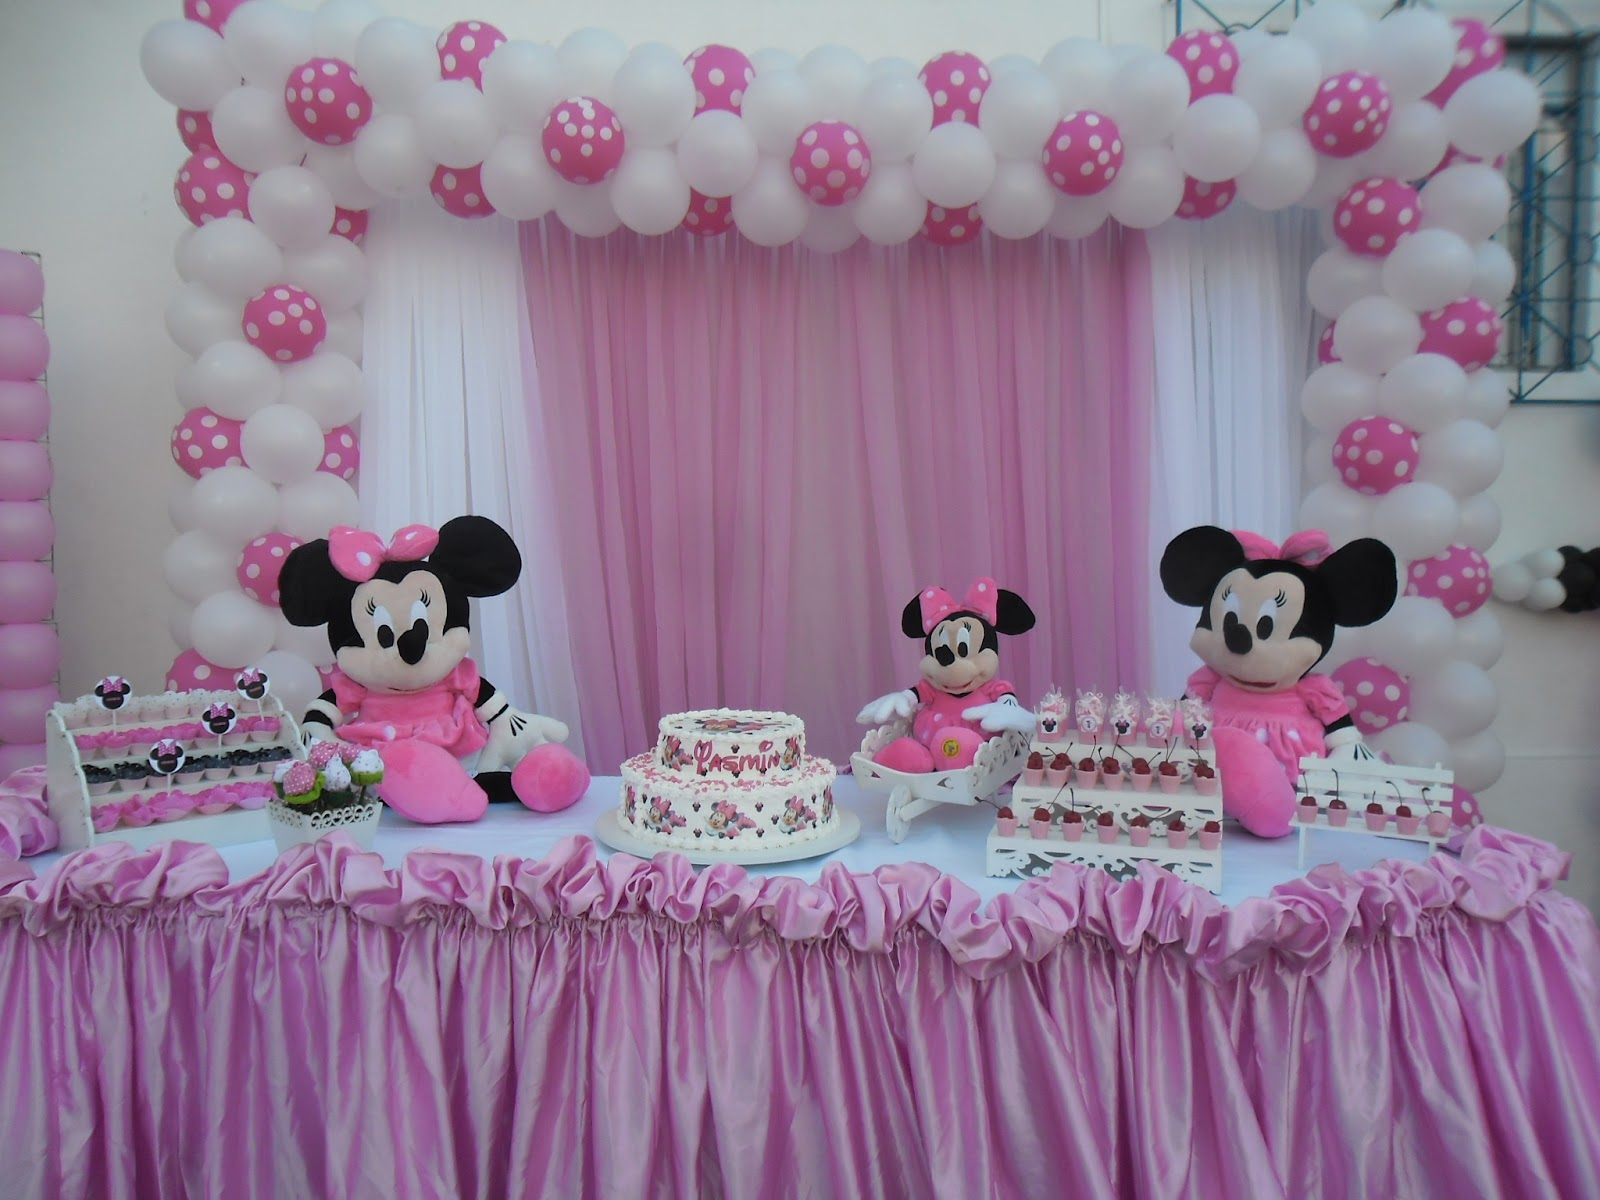 decoracao alternativa para festa infantil : decoracao alternativa para festa infantil:Decoracao De Festa Infantil